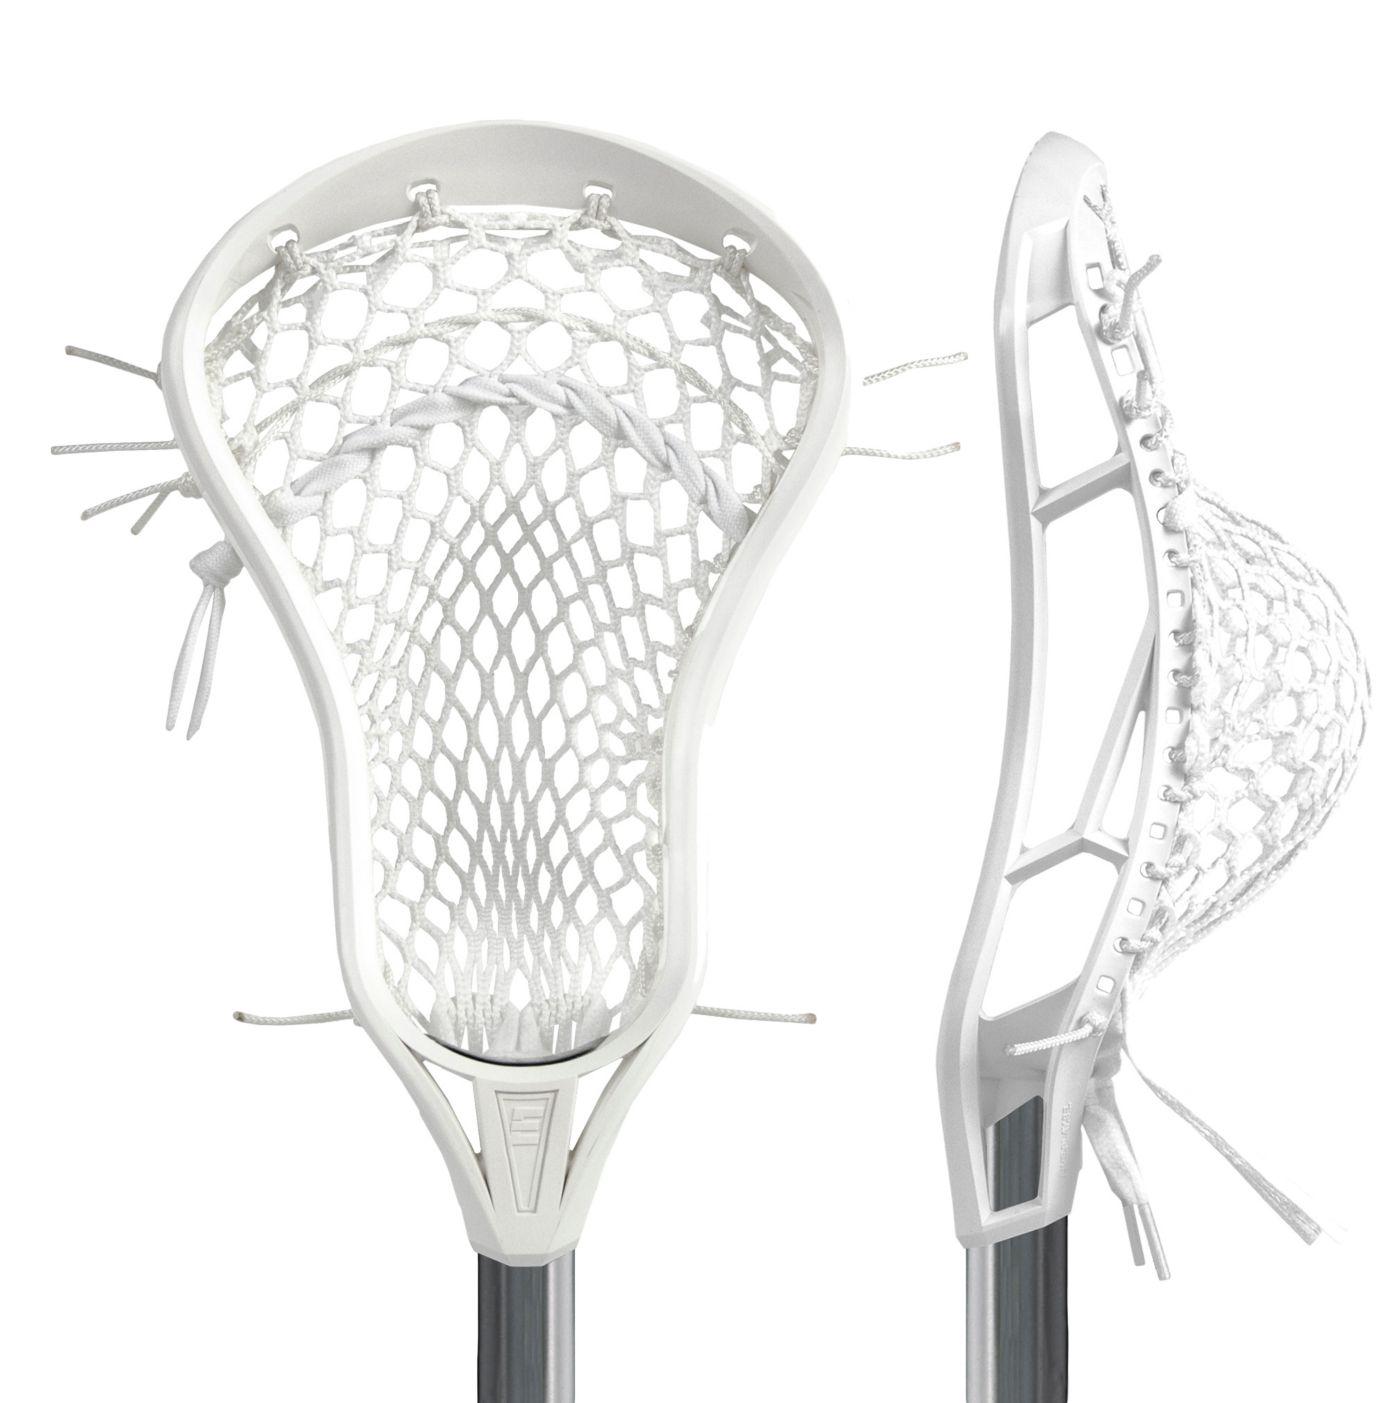 Epoch Men's Vision Complete Lacrosse Stick